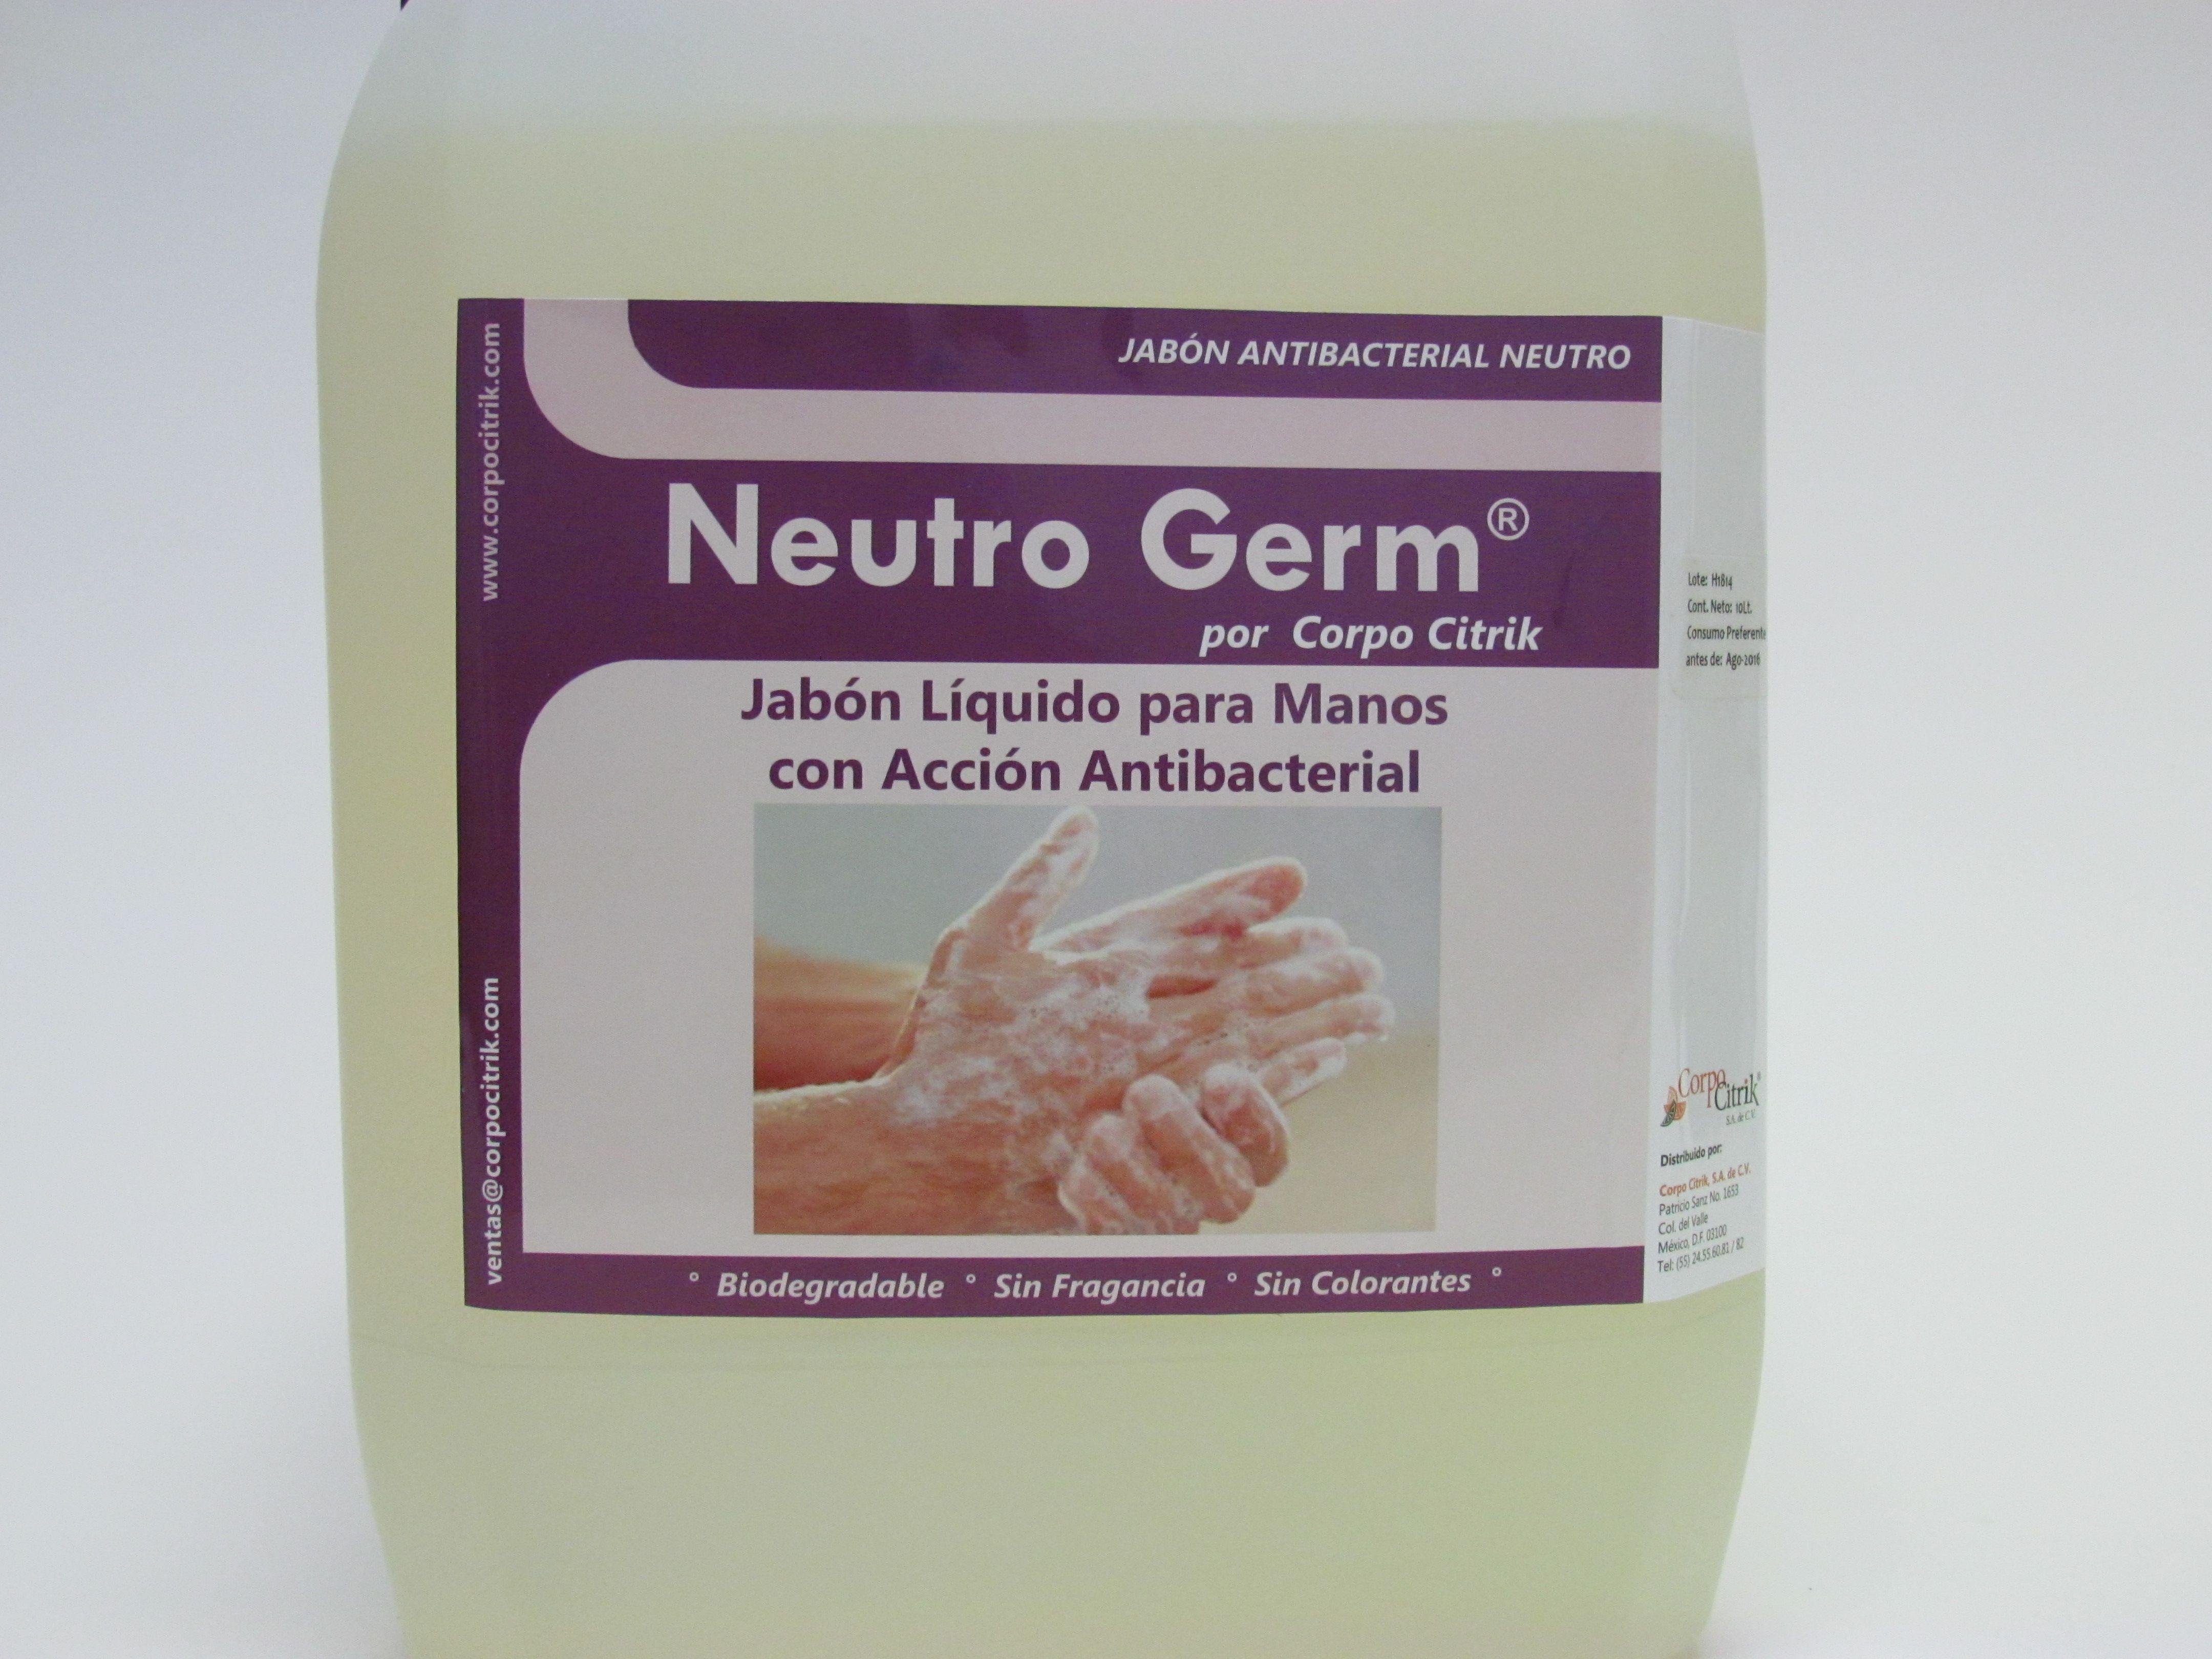 Neutro germ jab n germicida neutro para manos - Jabon neutro para limpiar ...